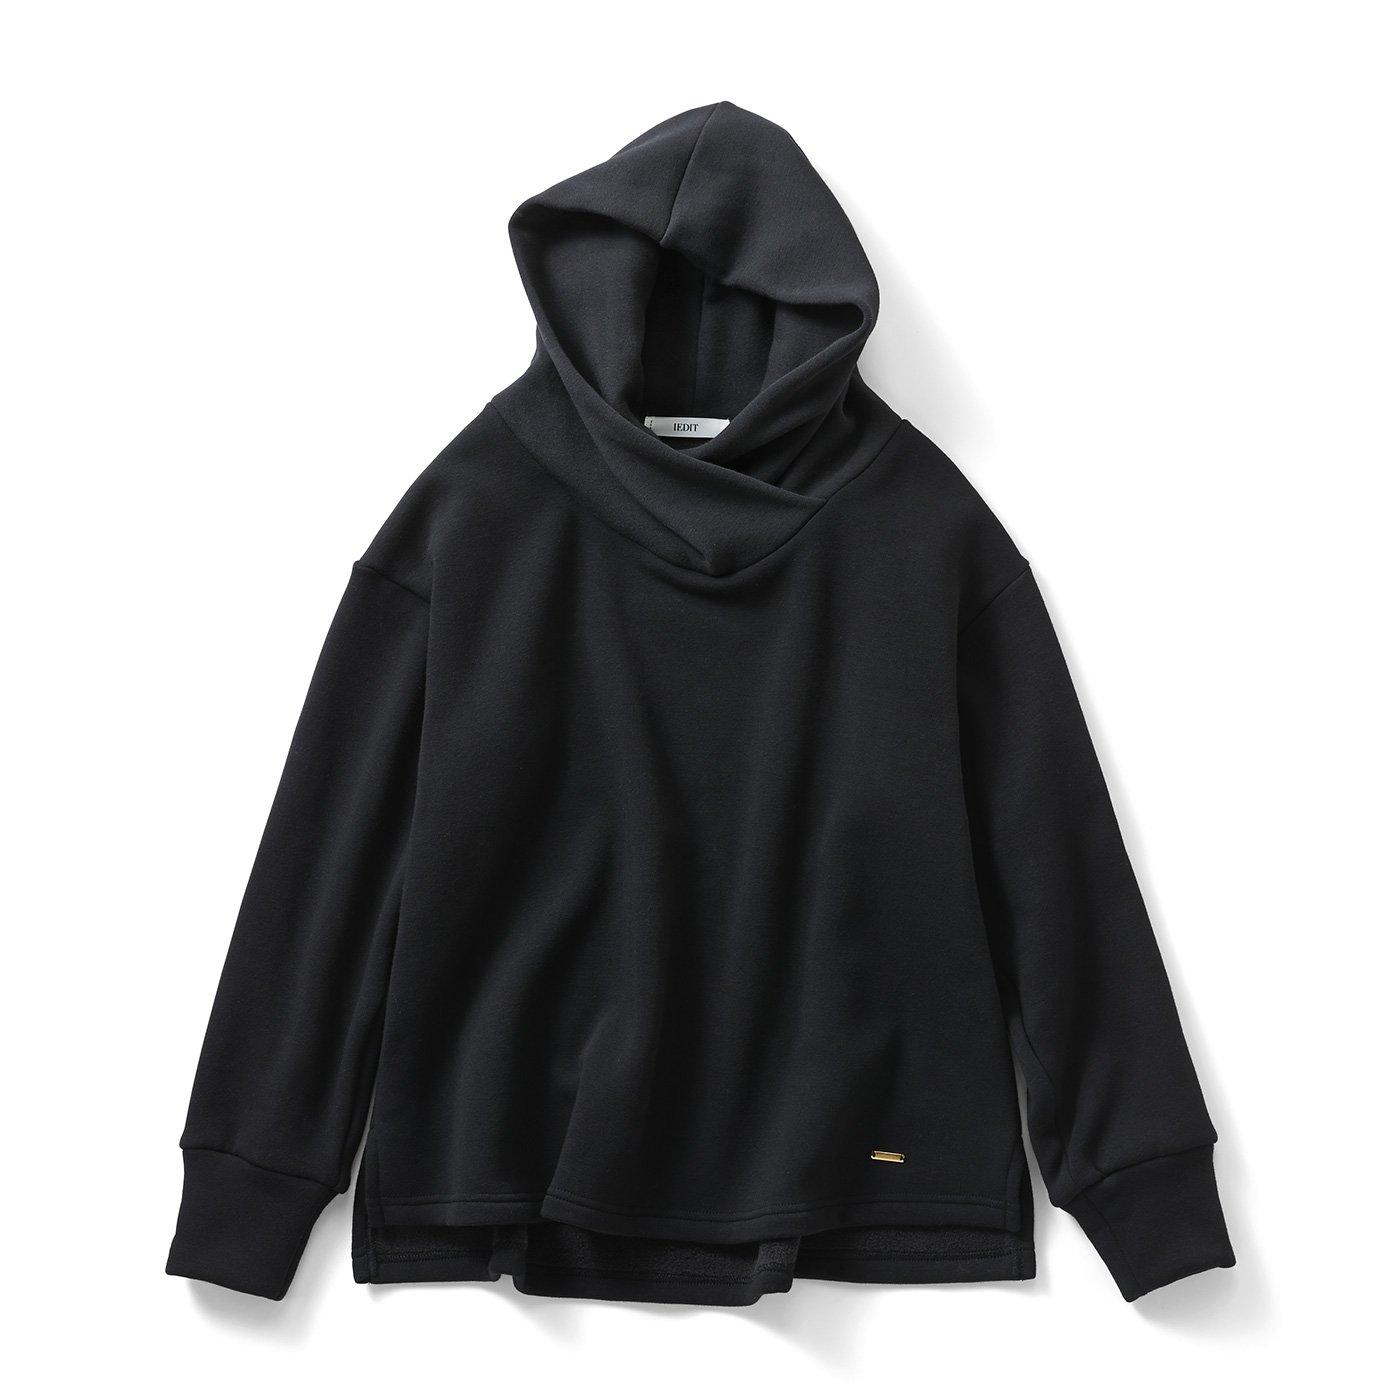 IEDIT[イディット] 裏シャギー素材が暖かい 衿高フードの小顔見えパーカー〈ブラック〉